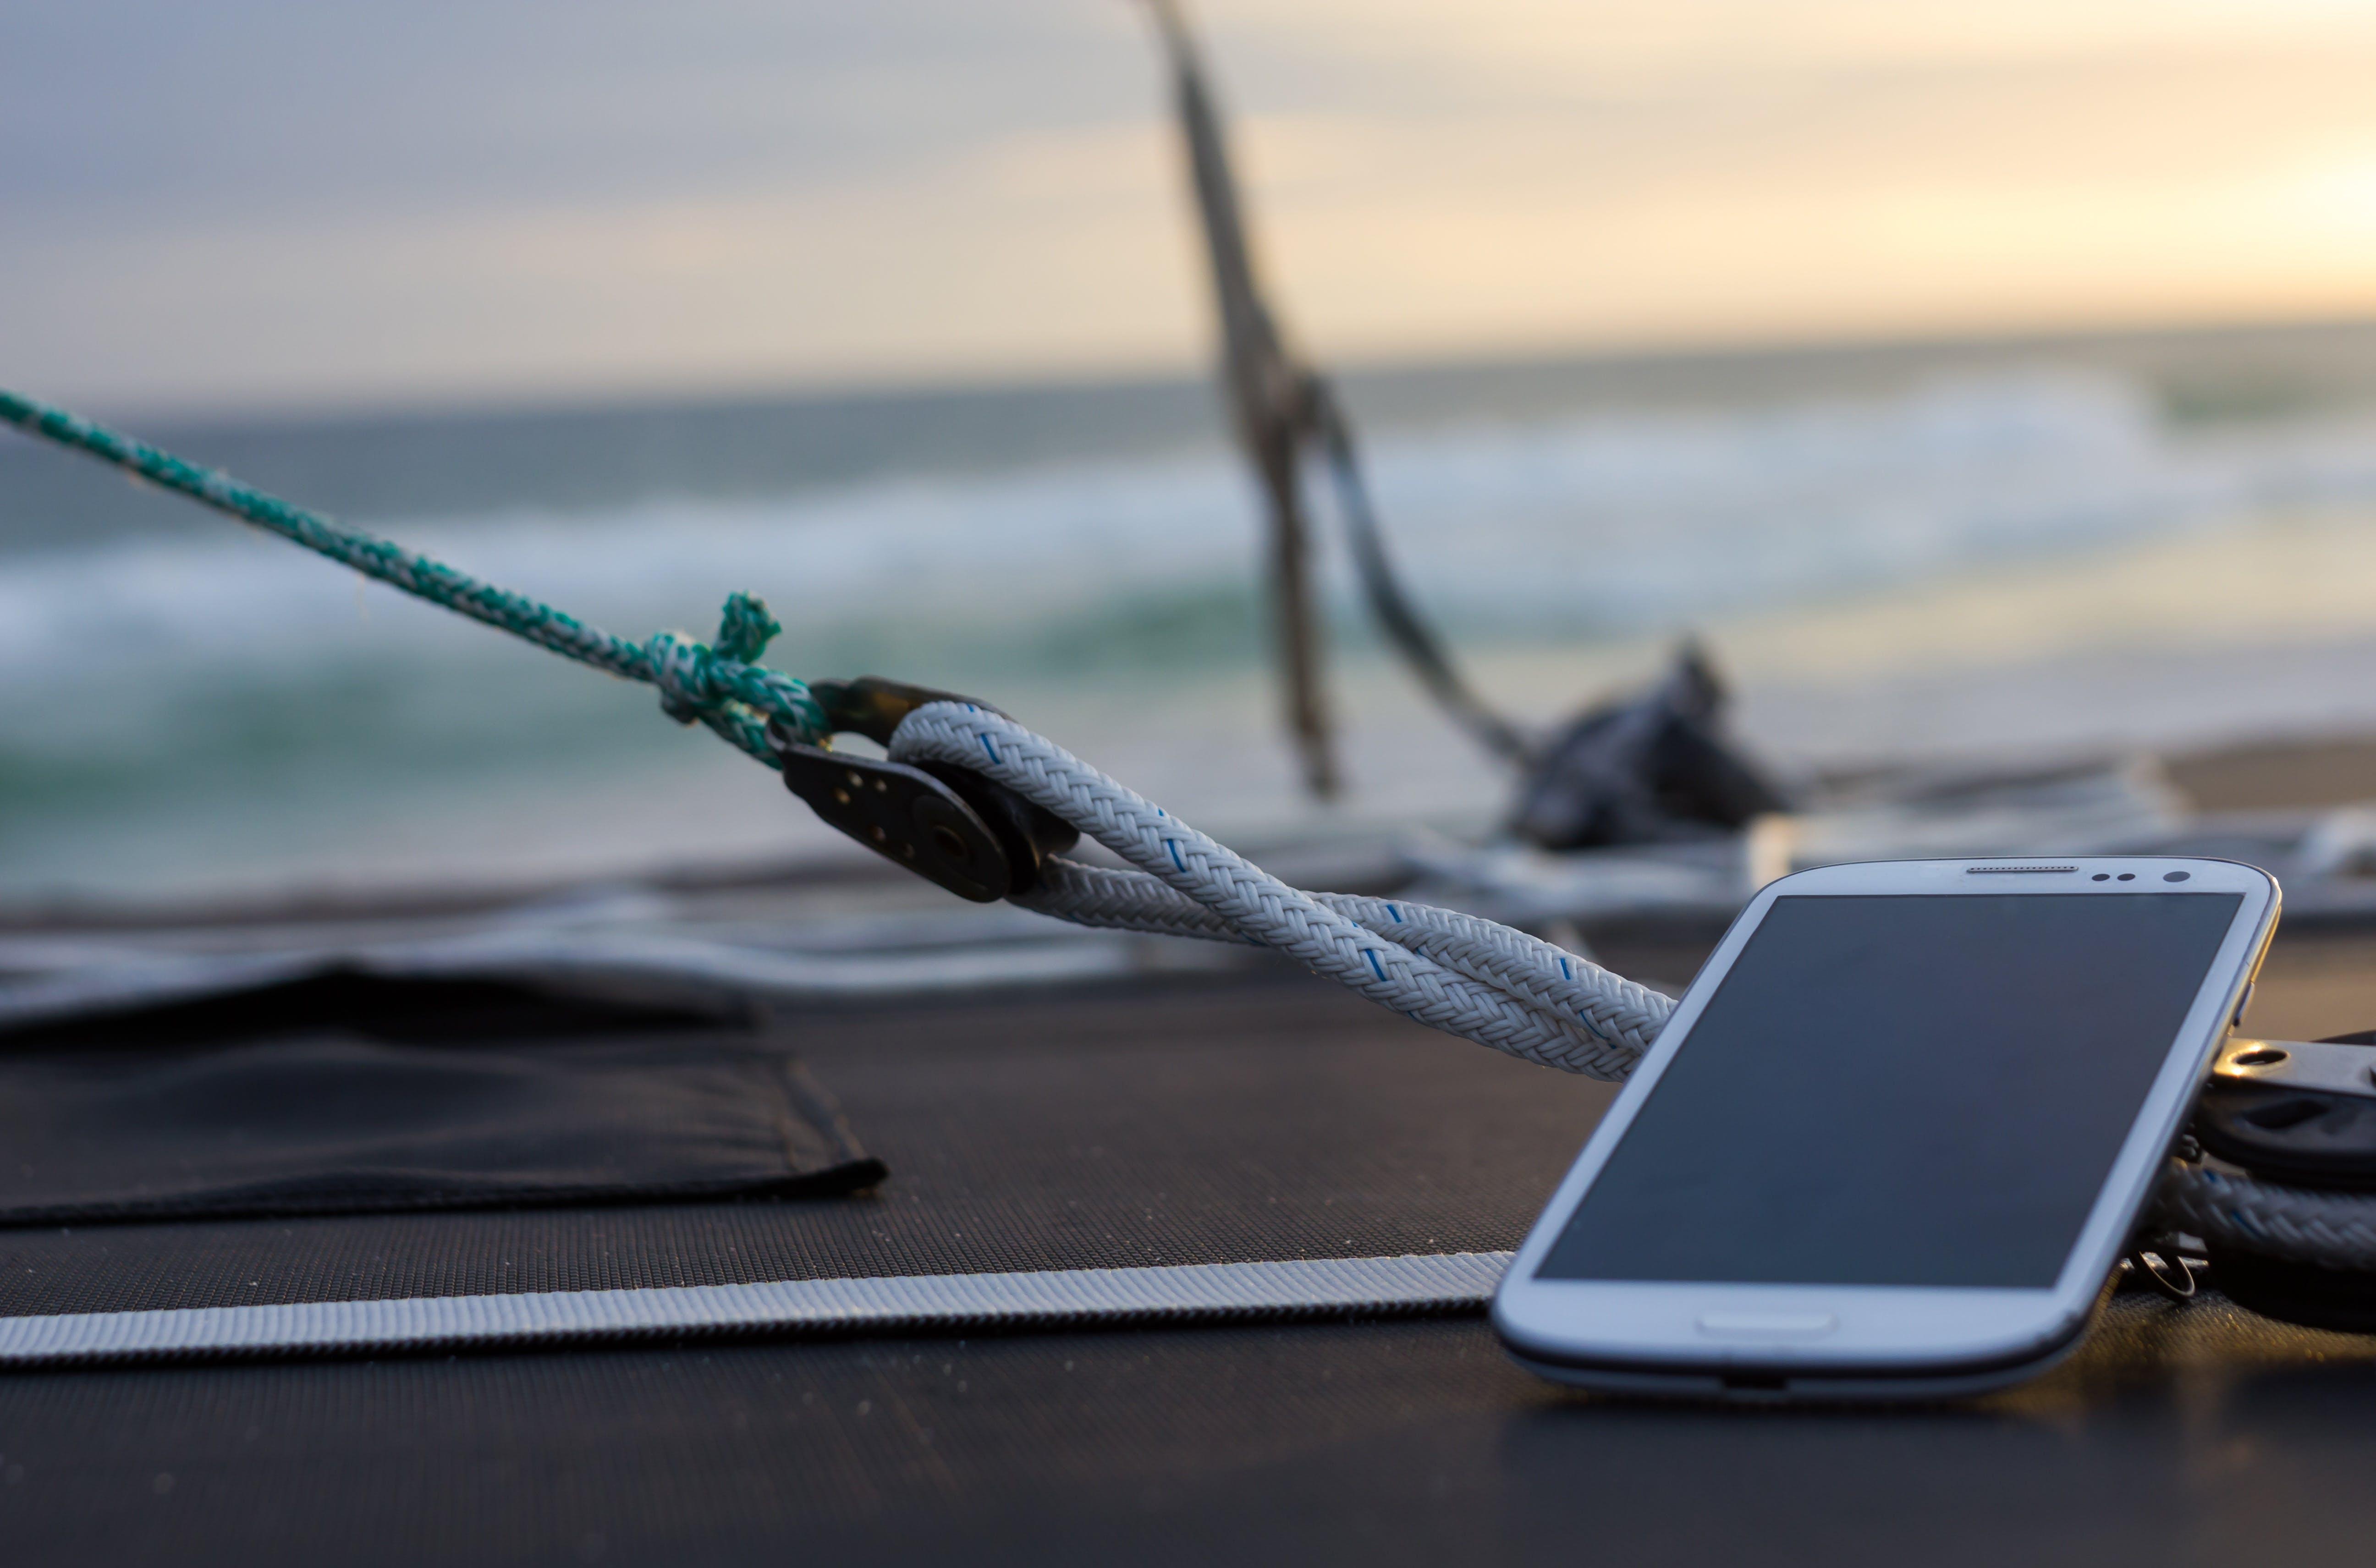 beach, boat, mobile phone